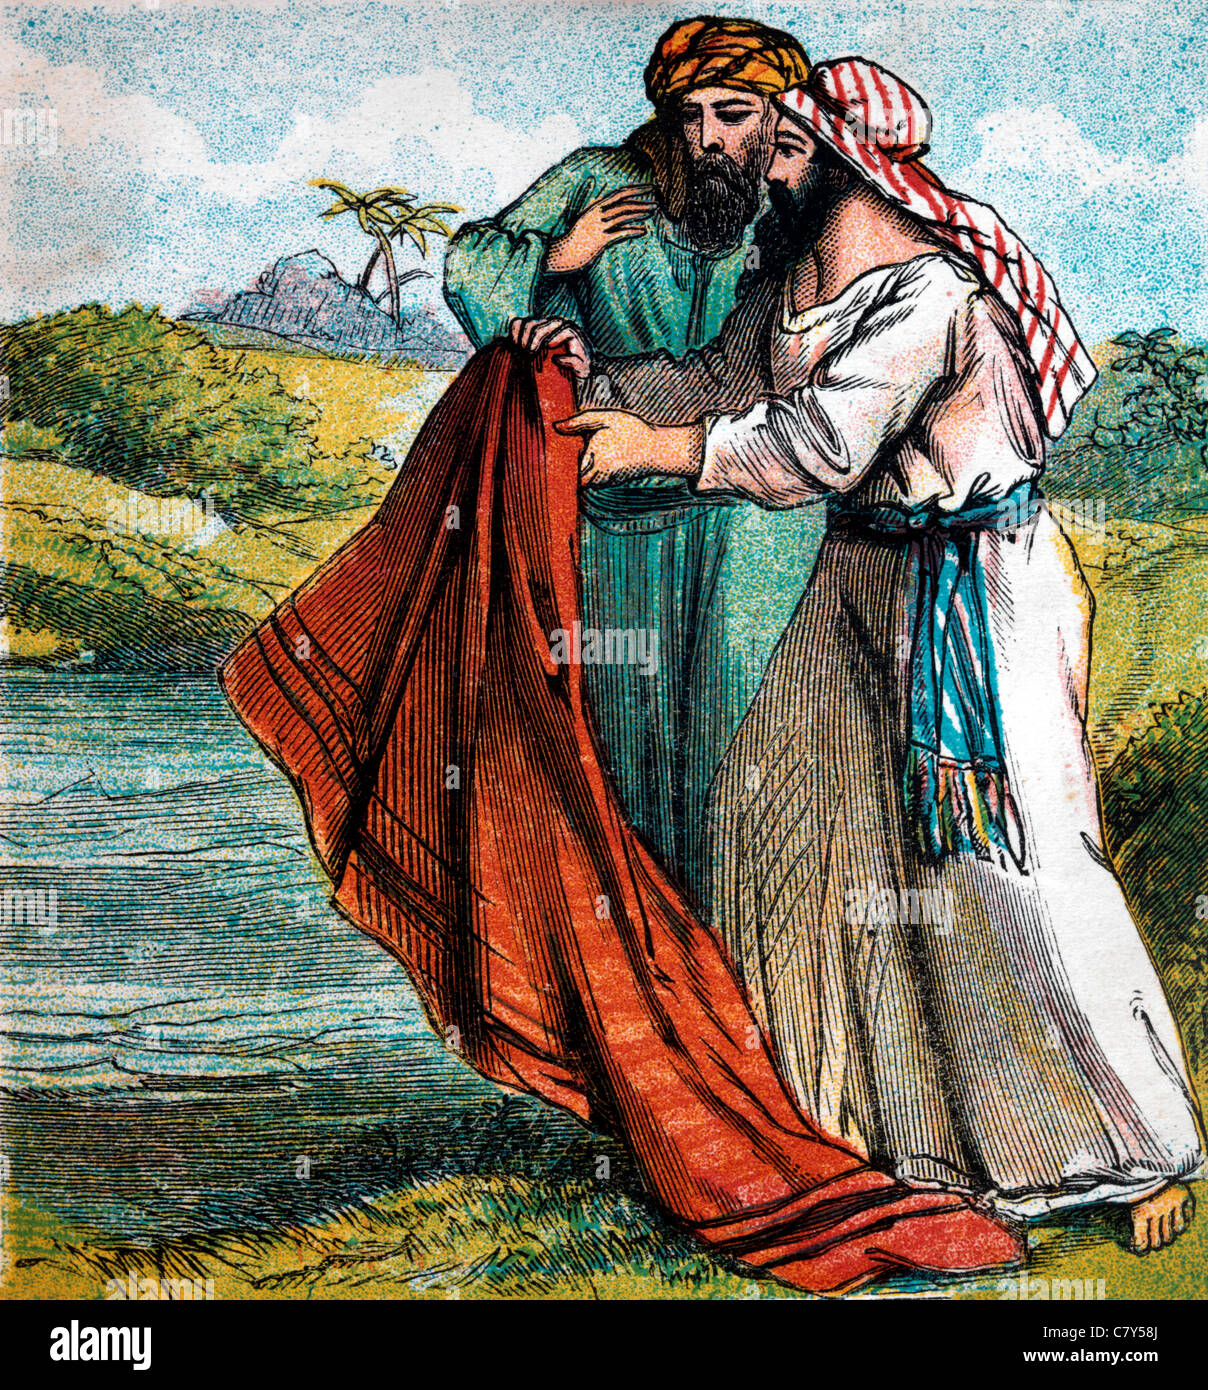 Bible Stories Illustration Of Elijah And Elisha Elijah